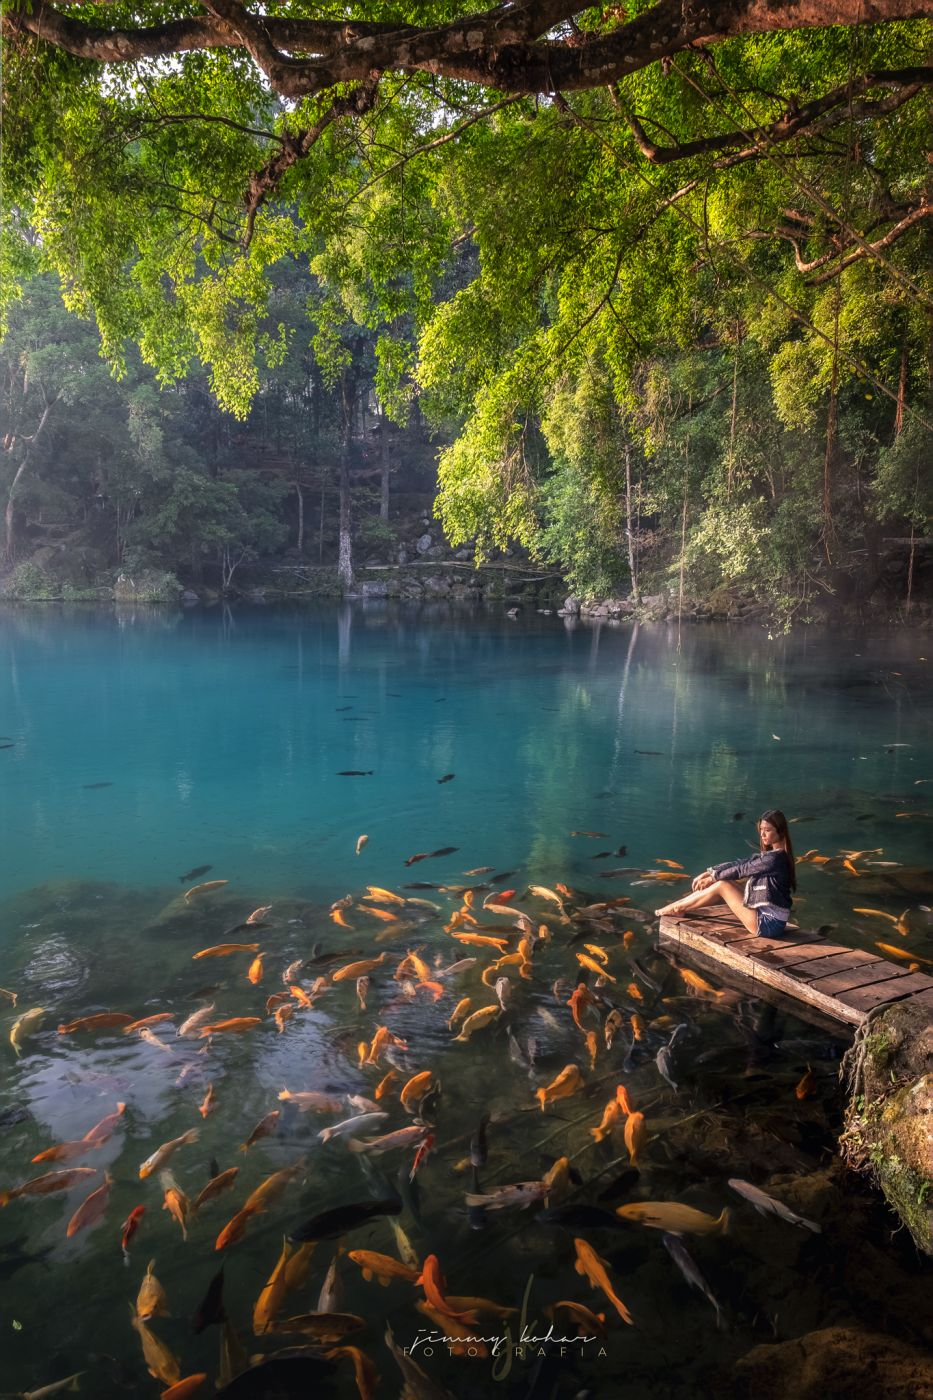 Blue Lagoon of Situ Cicerem, Indonesia